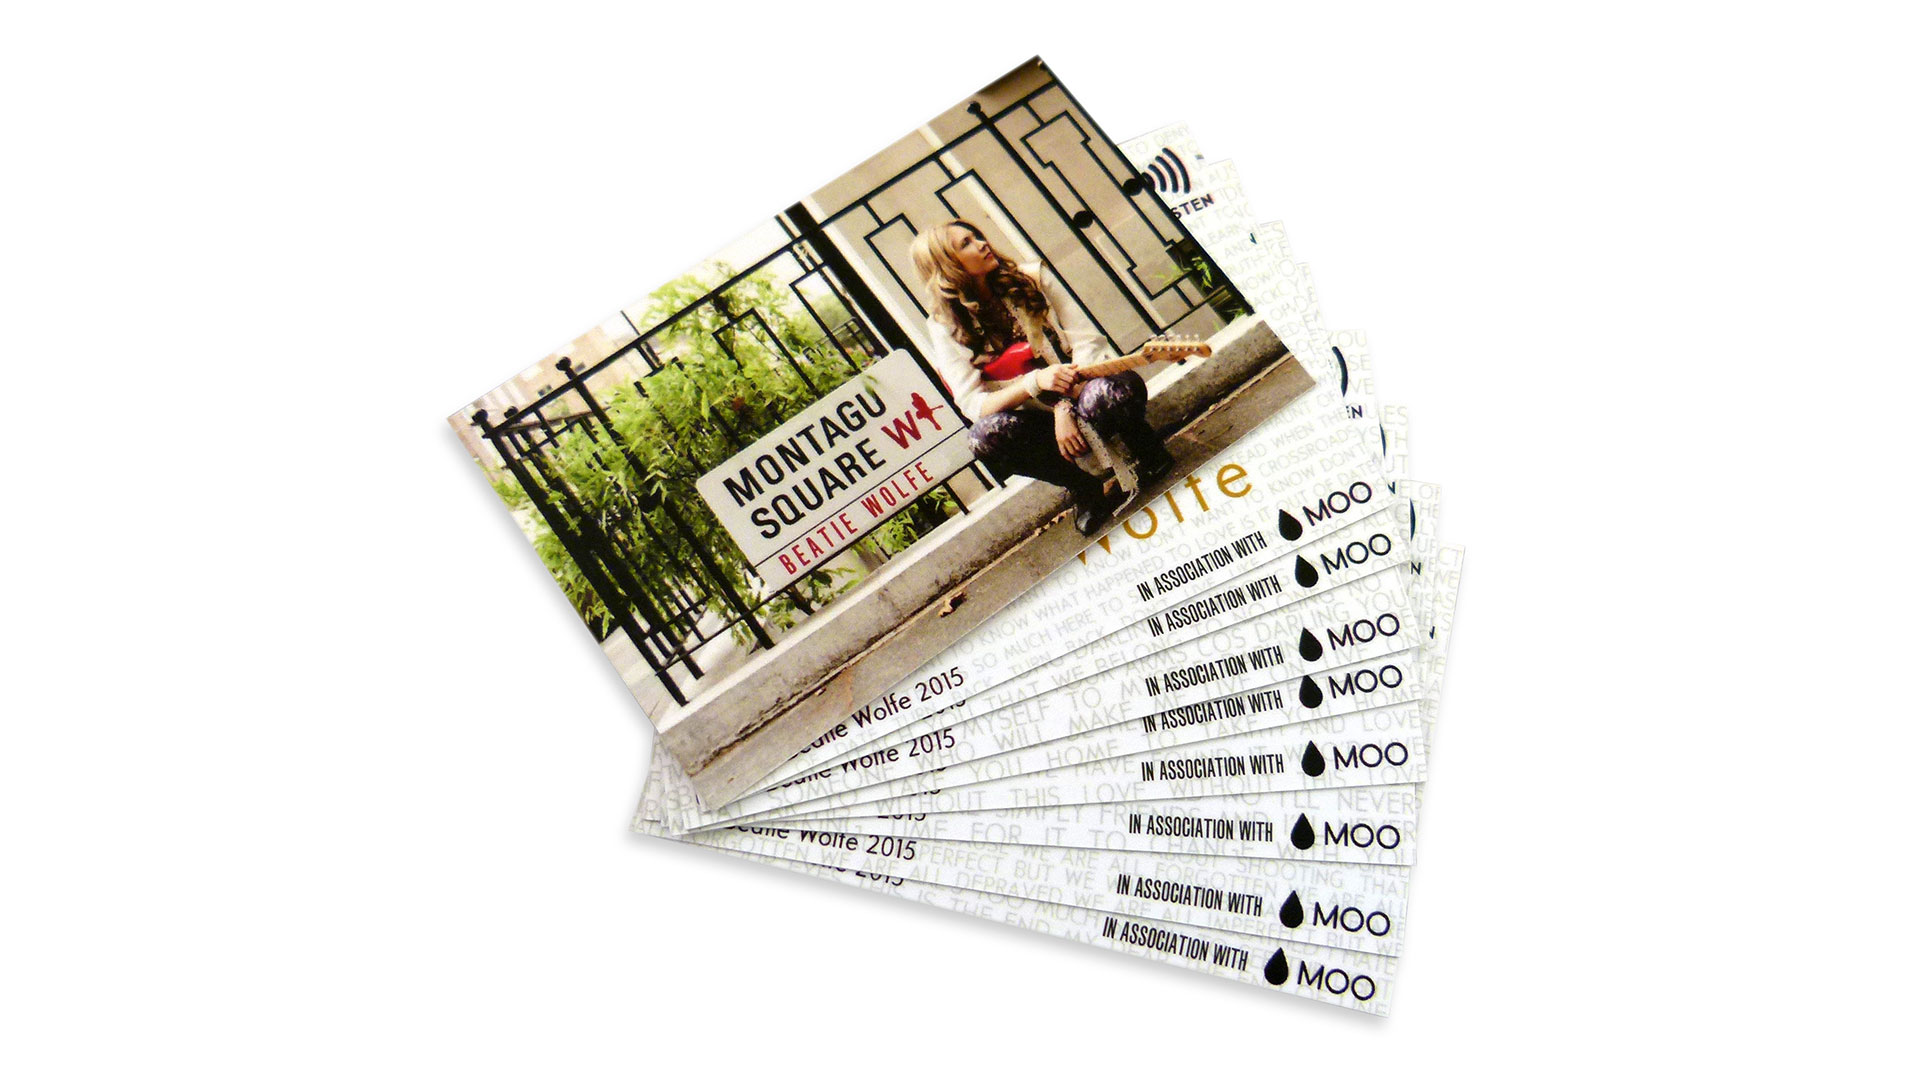 Beatie Wolfe - 2015 Montagu Square - Music Album Deck of Cards - World's First (2).jpg